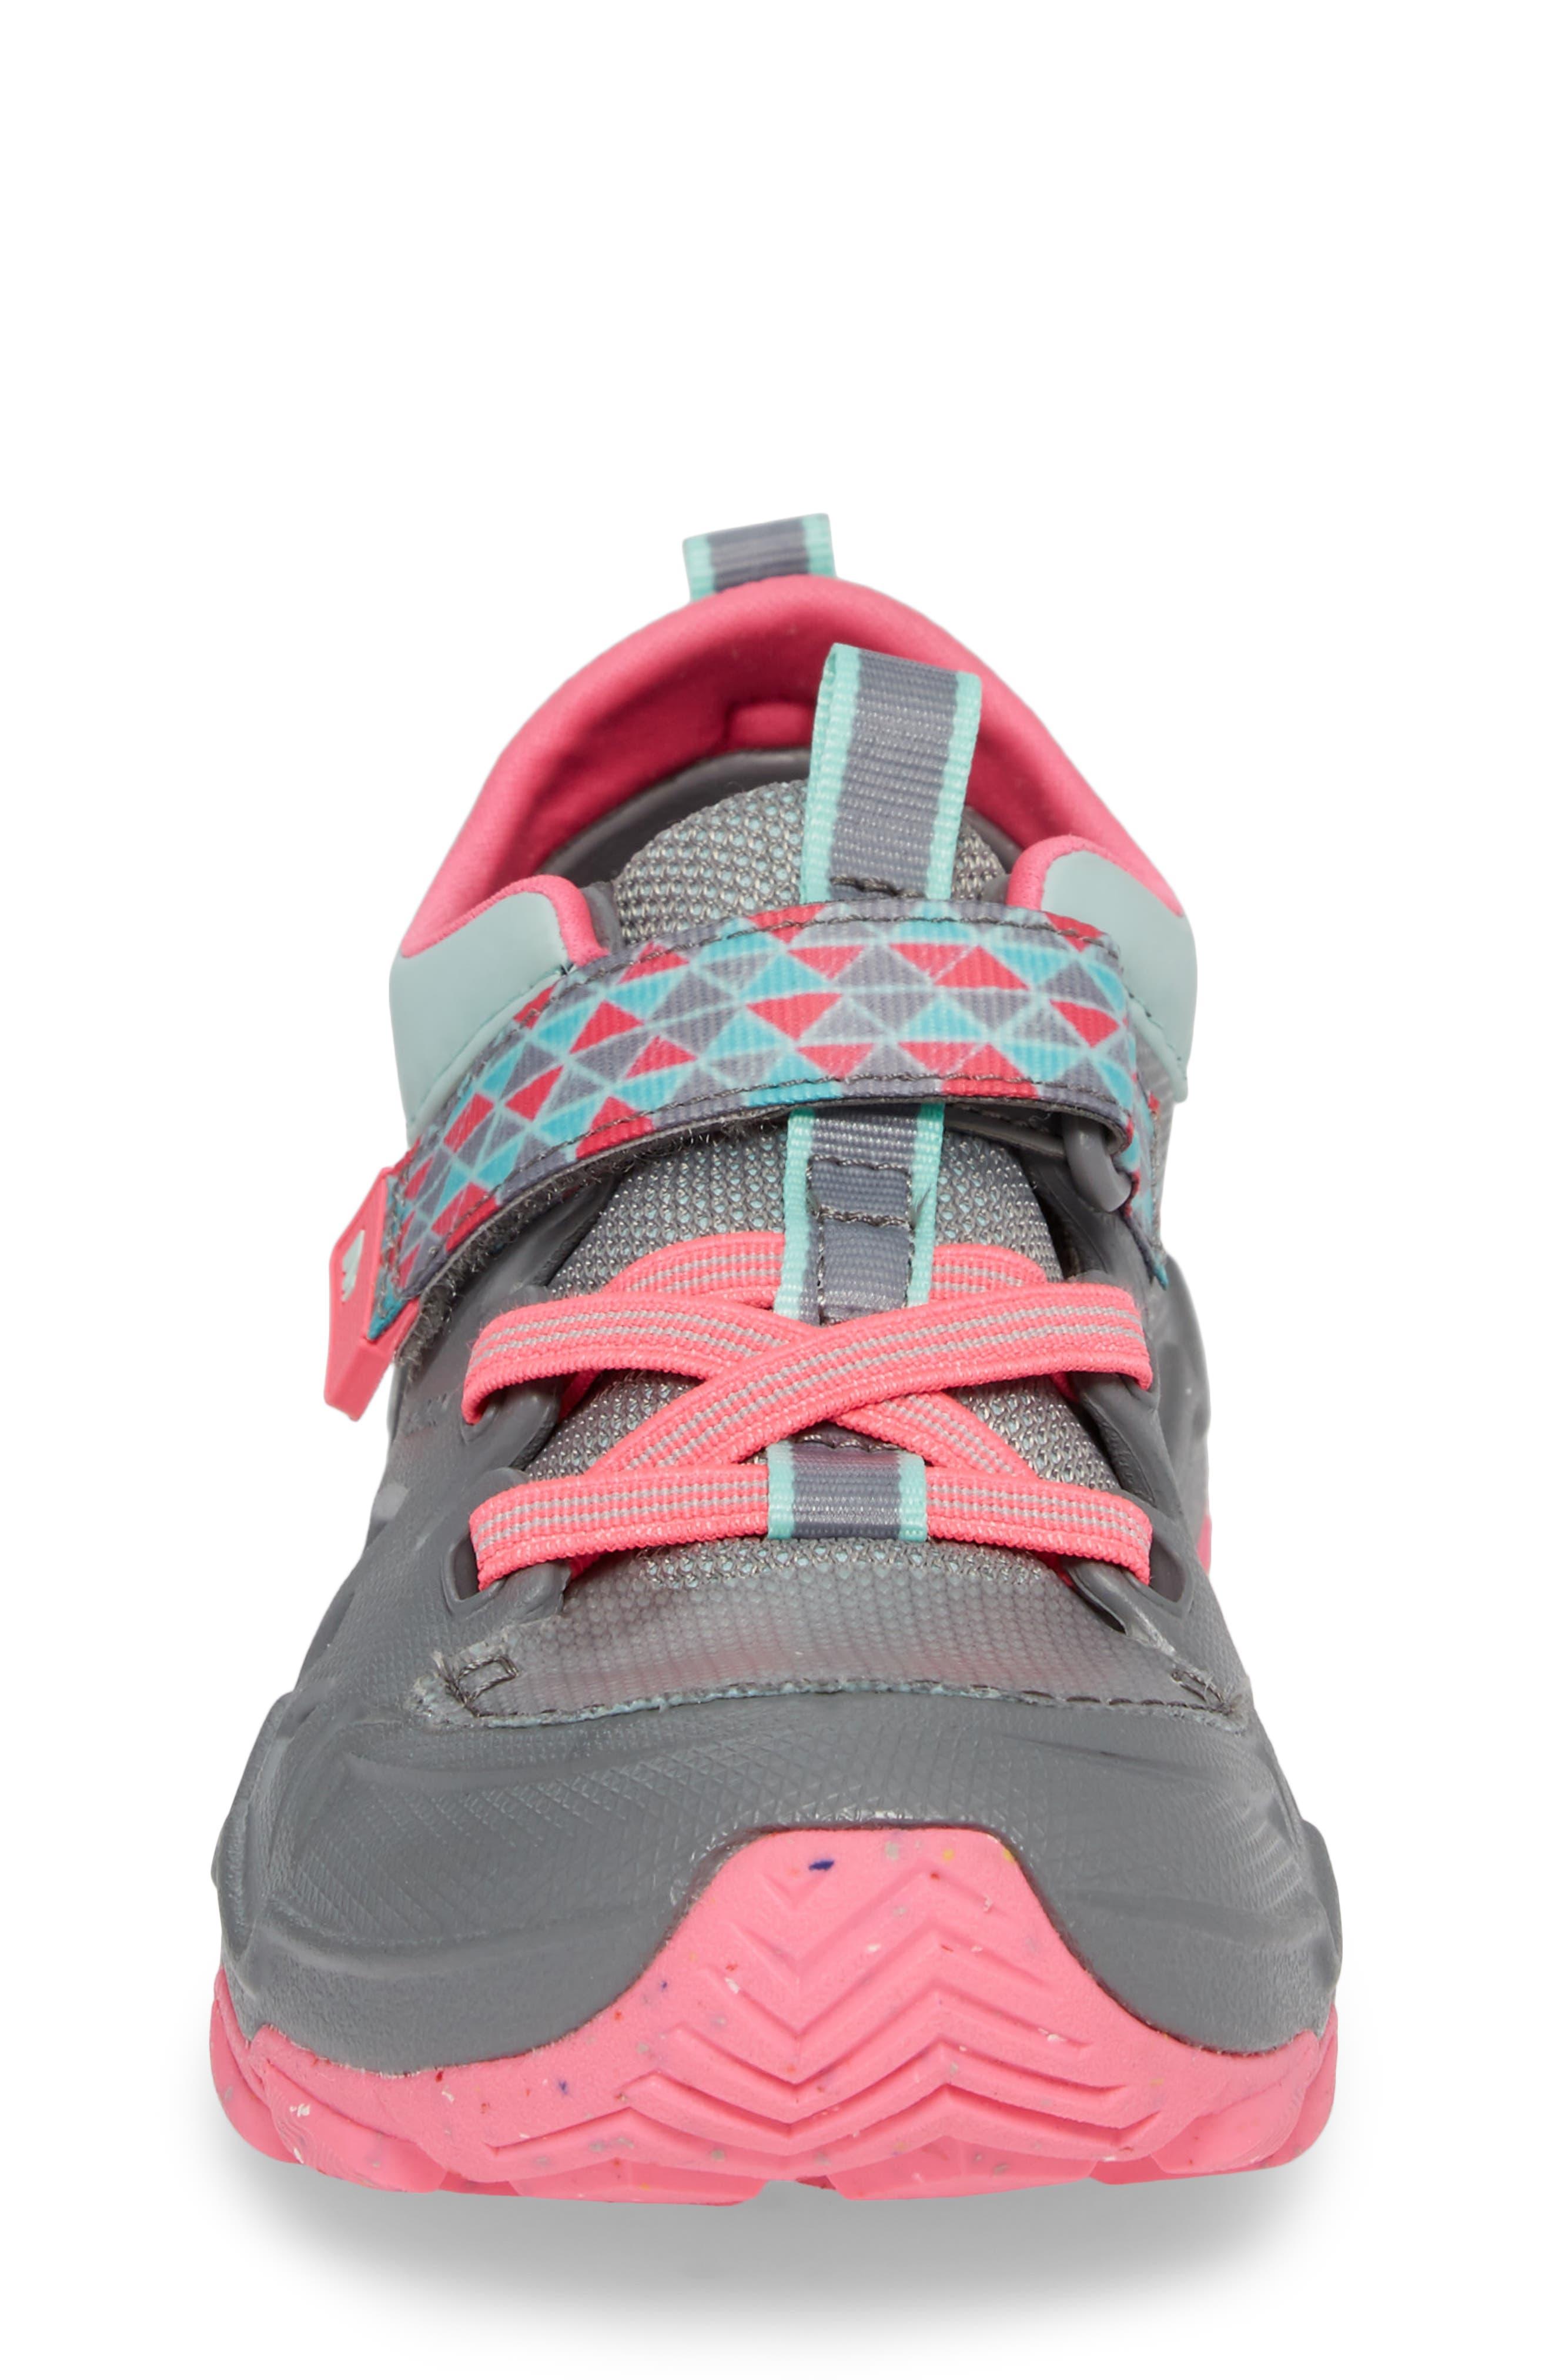 Hydro 2.0 Water Friendly Sneaker,                             Alternate thumbnail 4, color,                             Grey/ Multi